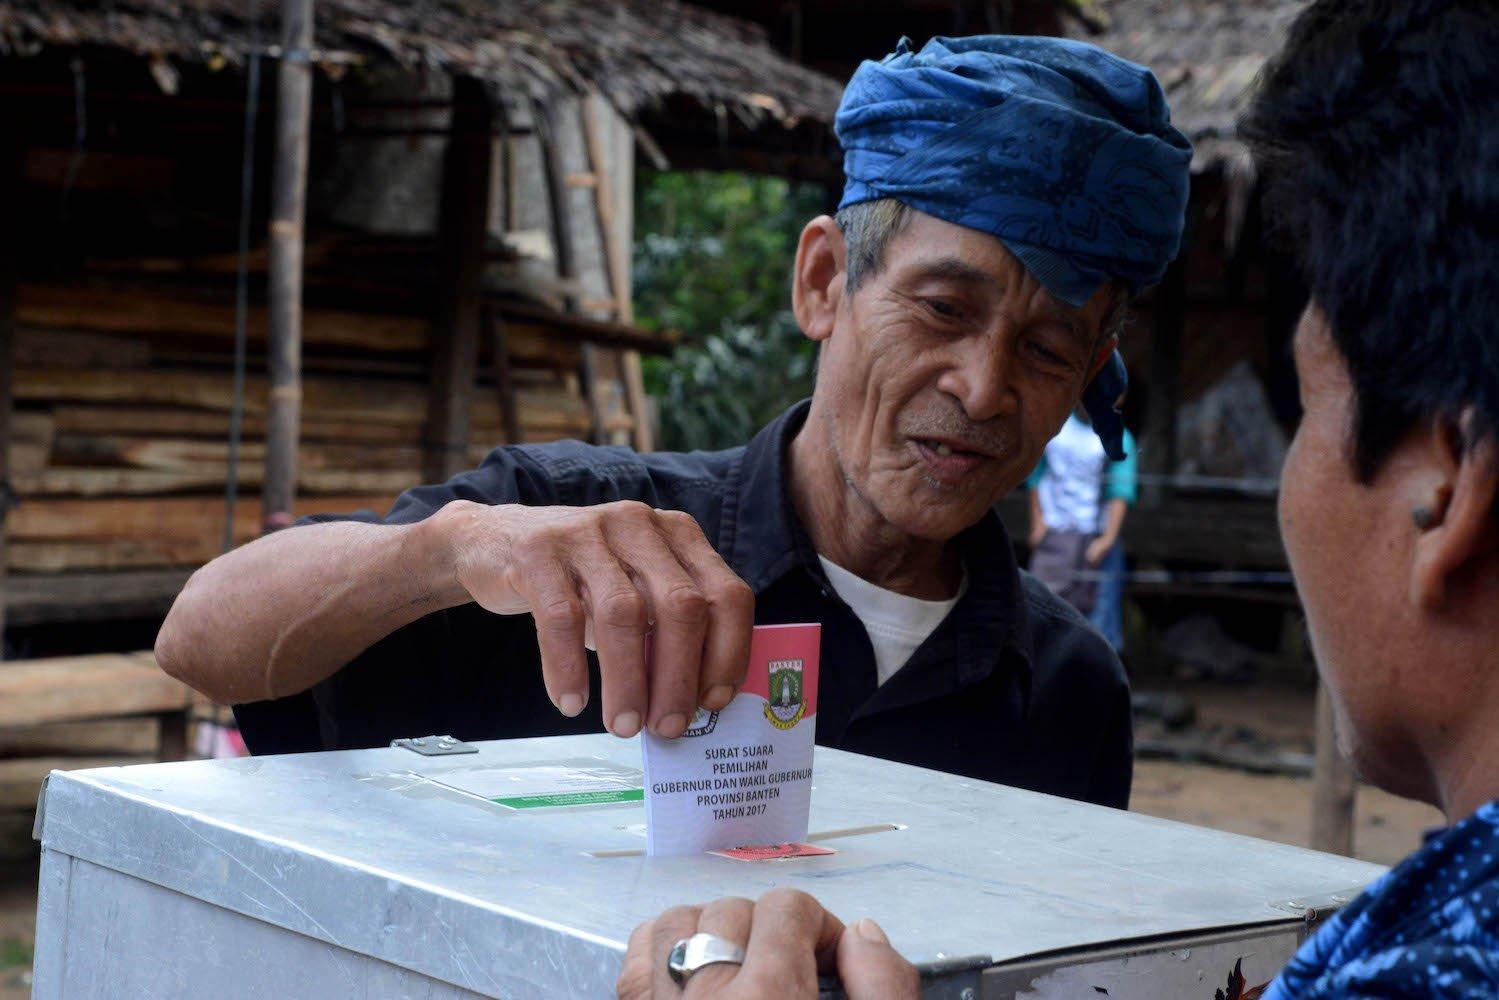 Warga Baduy Luar memasukkan kertas surat suara Pilkada Gubernur/Wagub Banten 2017 di di Tempat Pemungutan Suara (TPS) Desa Kanekes, Kecamatan Leuwidamar, Kabupaten Lebak, Banten, Rabu (15/2). Sebanyak 7.188 Daftar Pemilih Tetap (DPT) yang terdiri dari 3.698 pria dan 3.490 wanita suku Baduy menggunakan hak pilih mereka pada Pilkada Gubernur/Wagub Banten 2017.